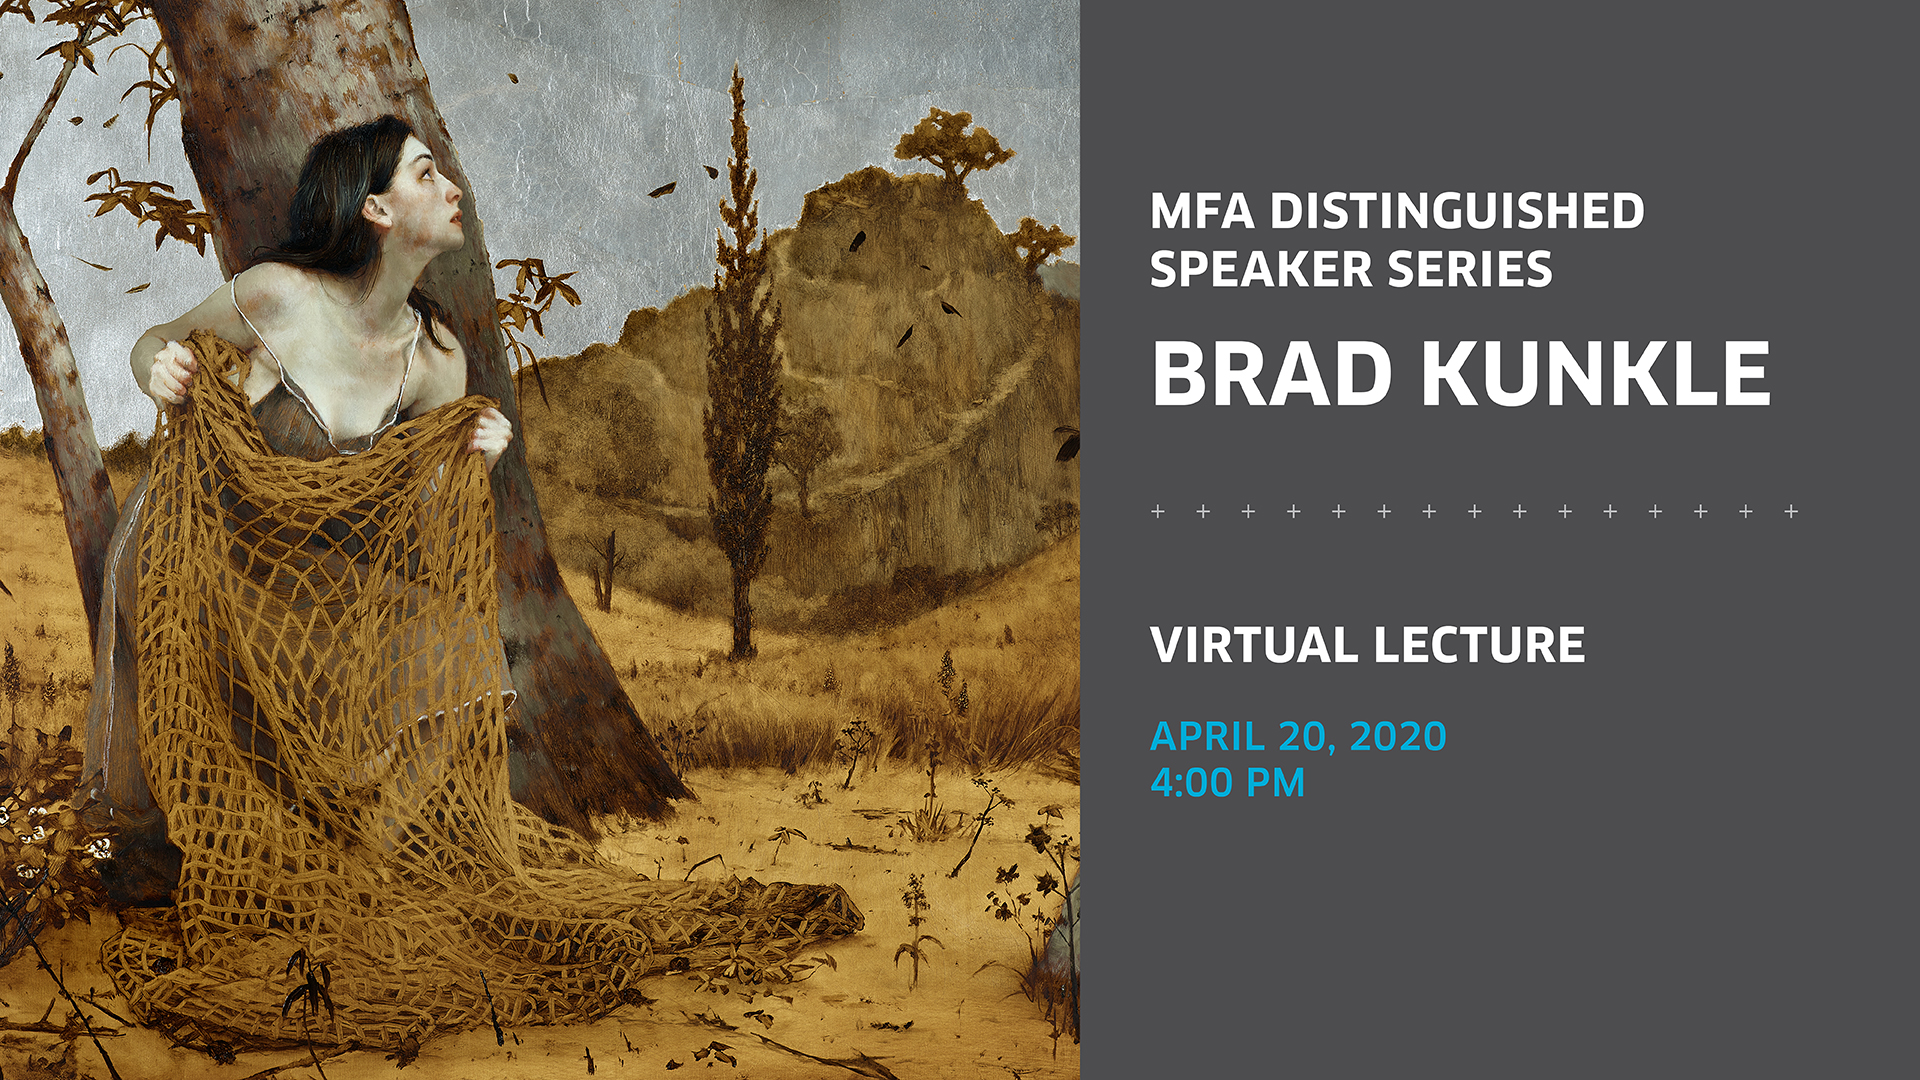 MFA_Speaker_Brad_Kunkle_My_LCAD_Final